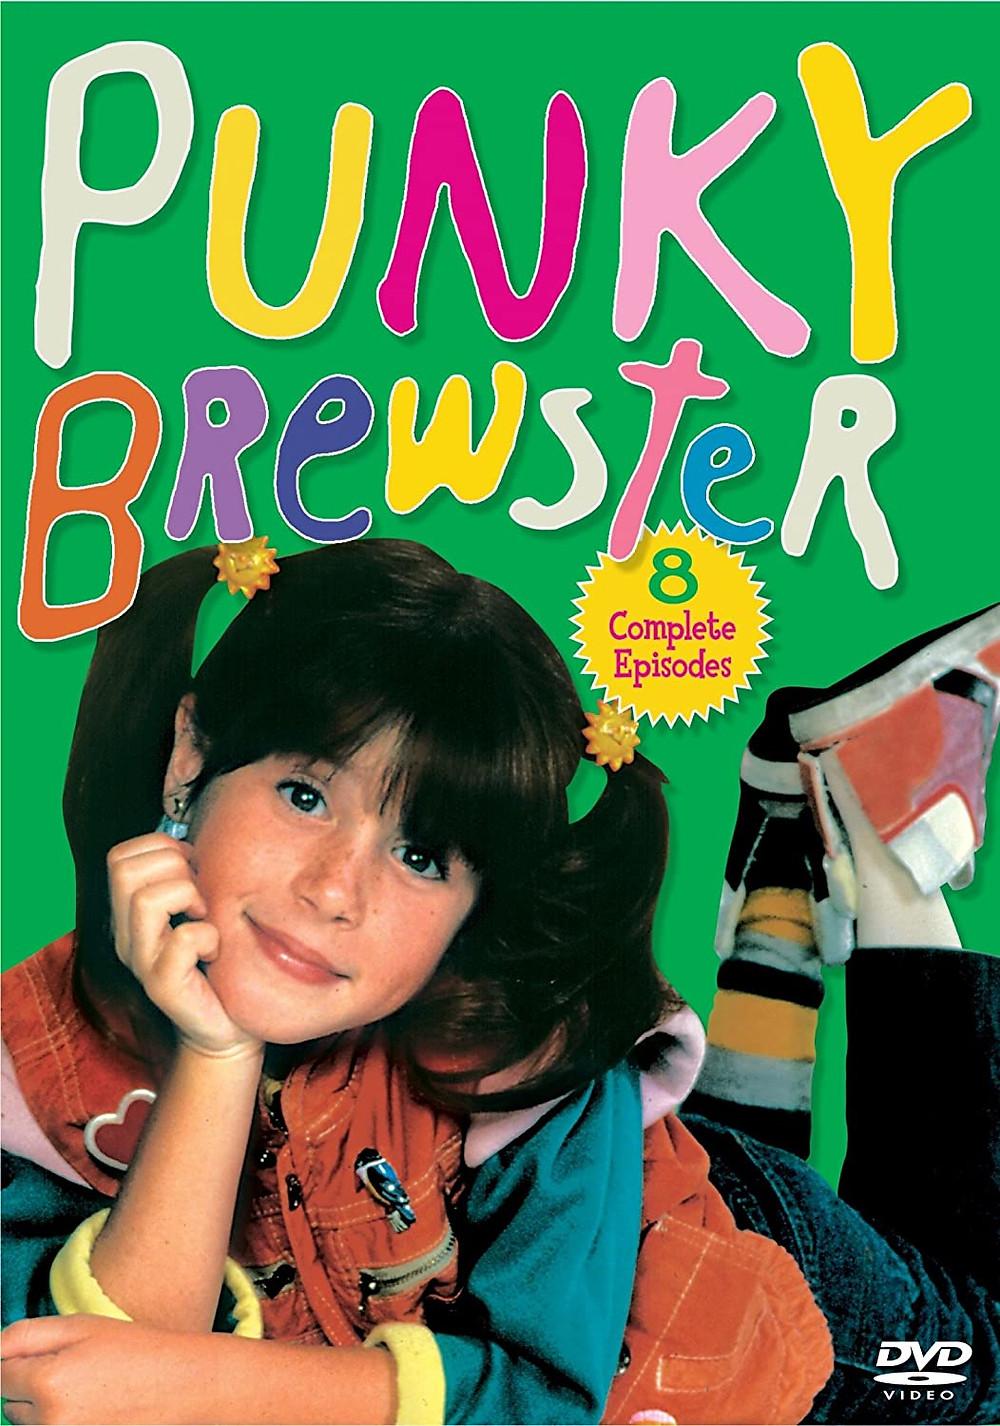 Punky Brewster starring Solei Moon Frye